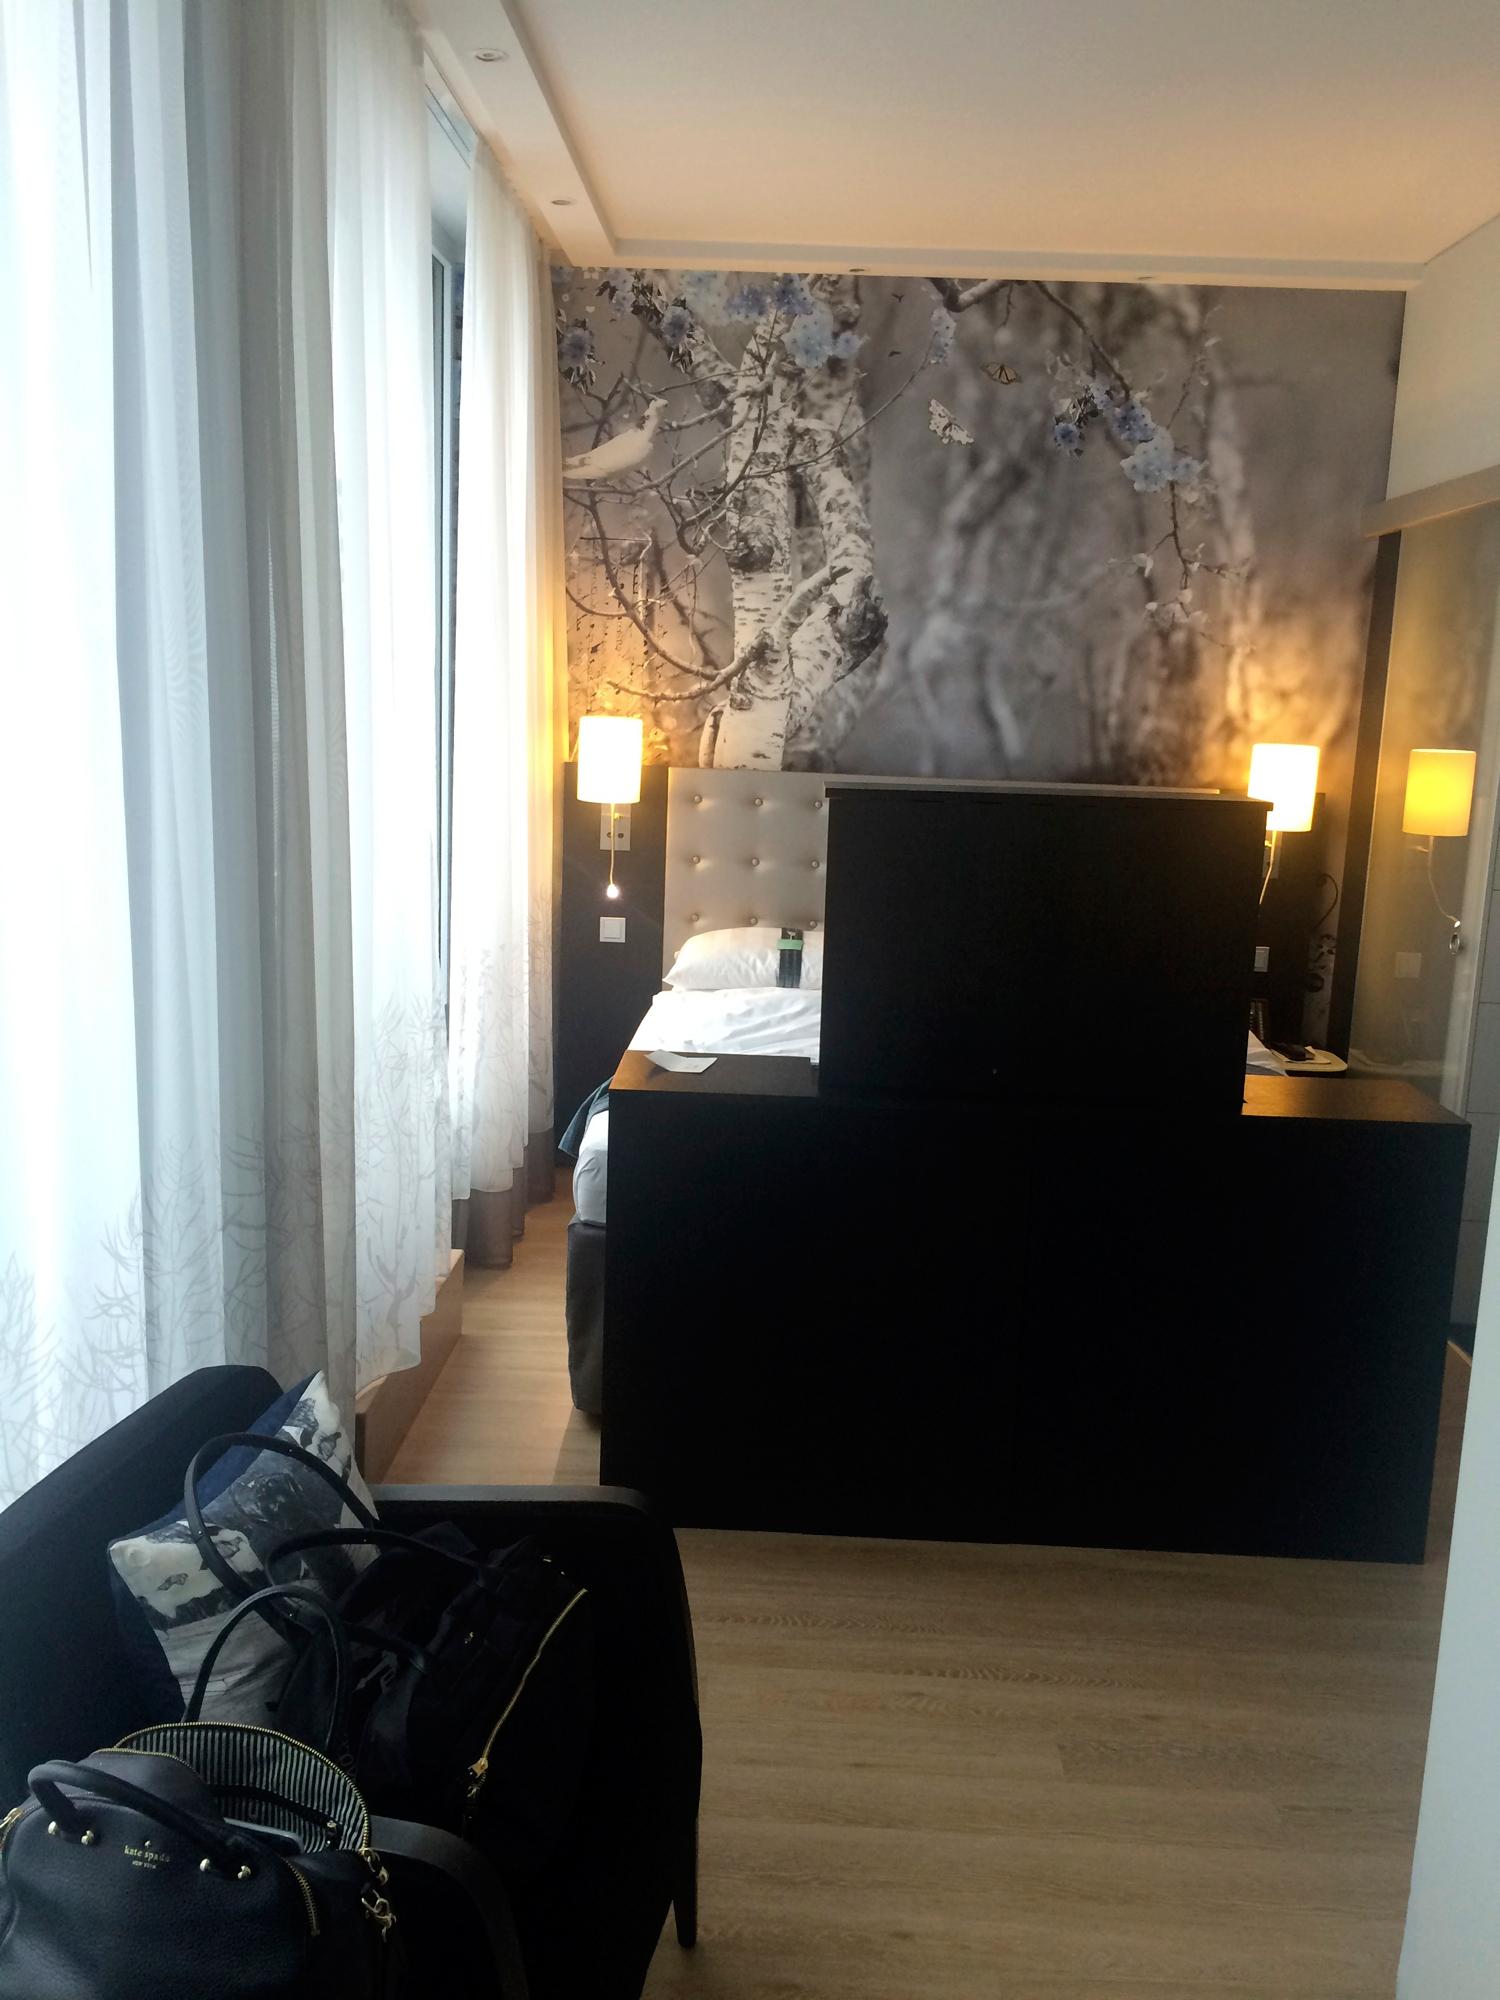 HolidayInn-Room